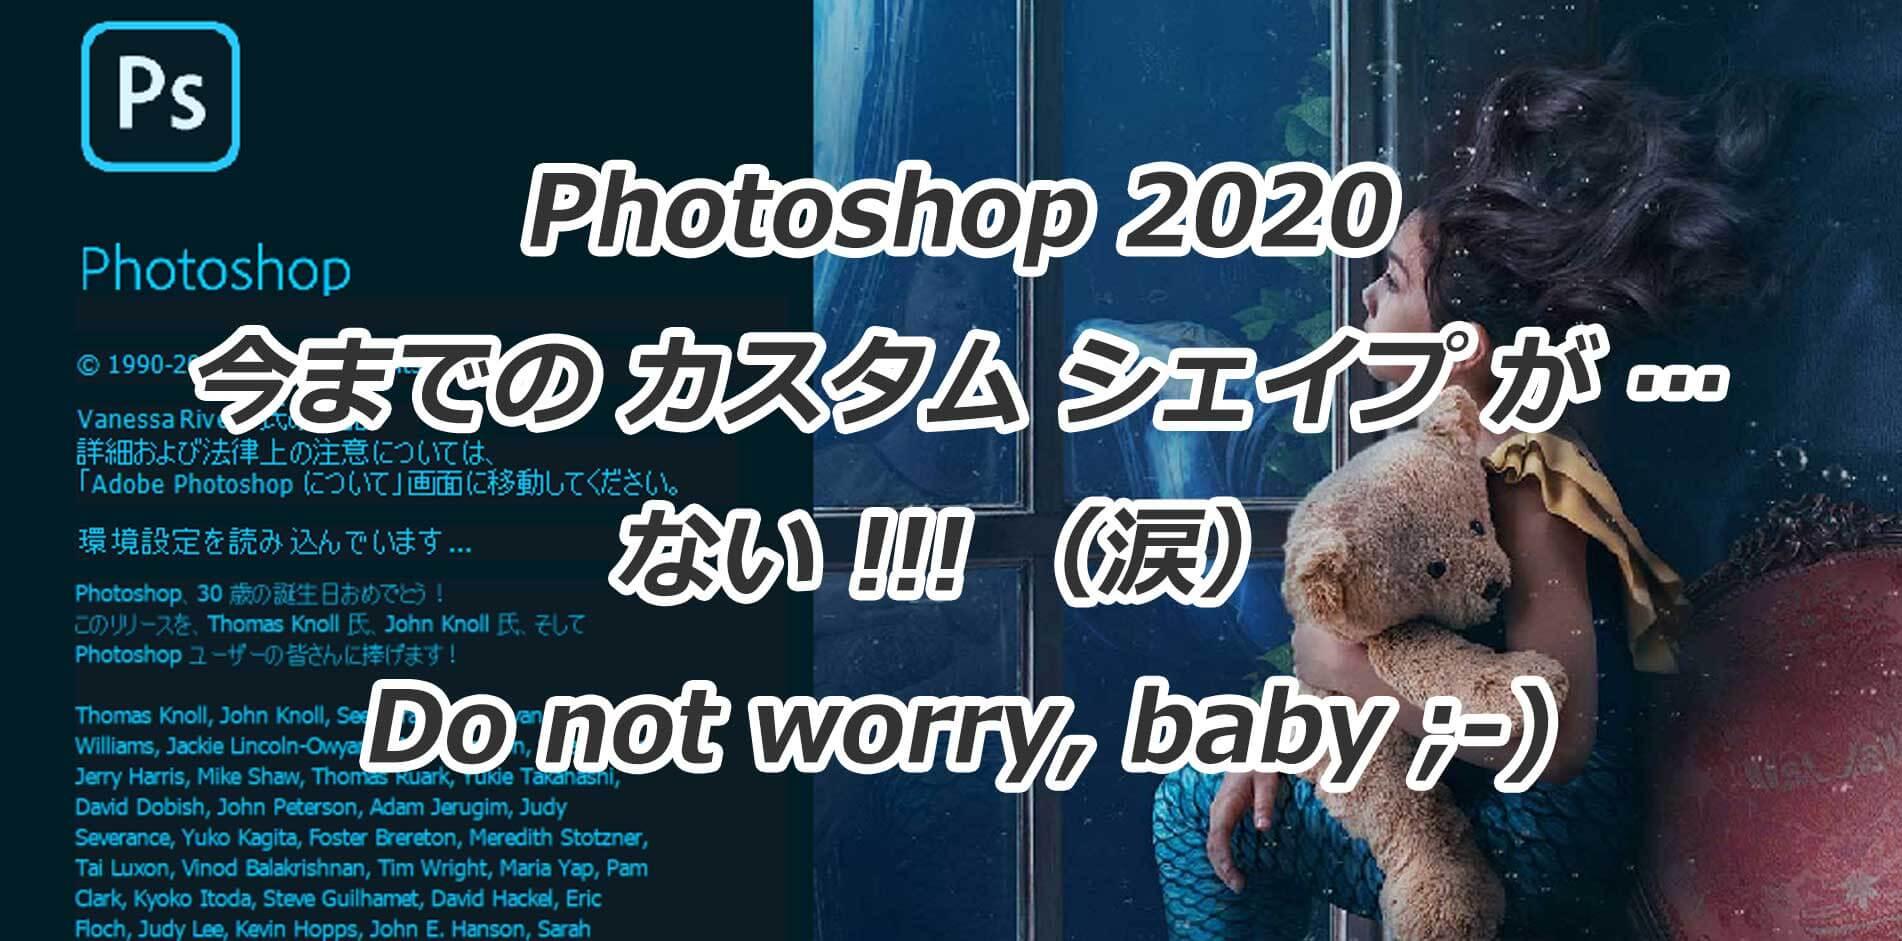 Photoshop 2020で従来のカスタムシェイプが無い問題